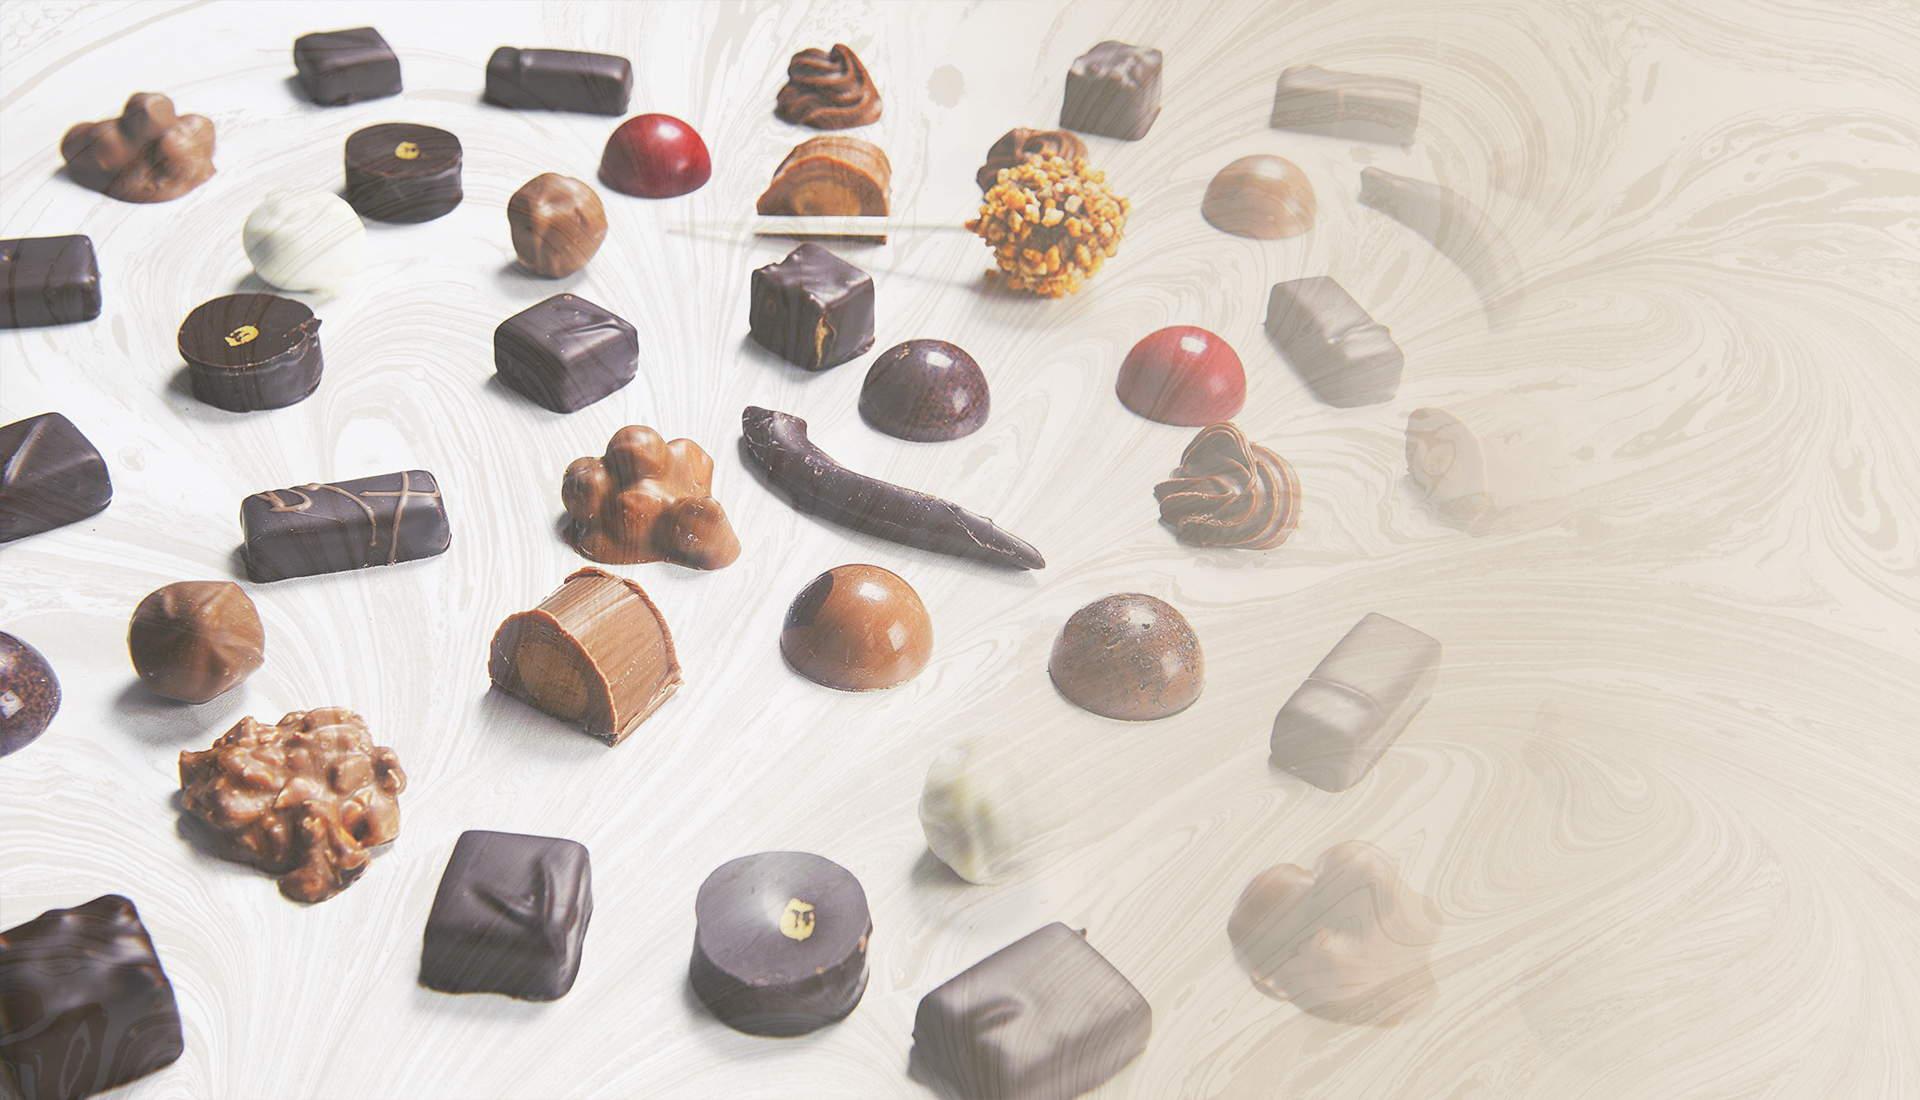 Tienda online de bombones artesanos de calidad Arguelles Chocolatier - arguelleschocolatier.com